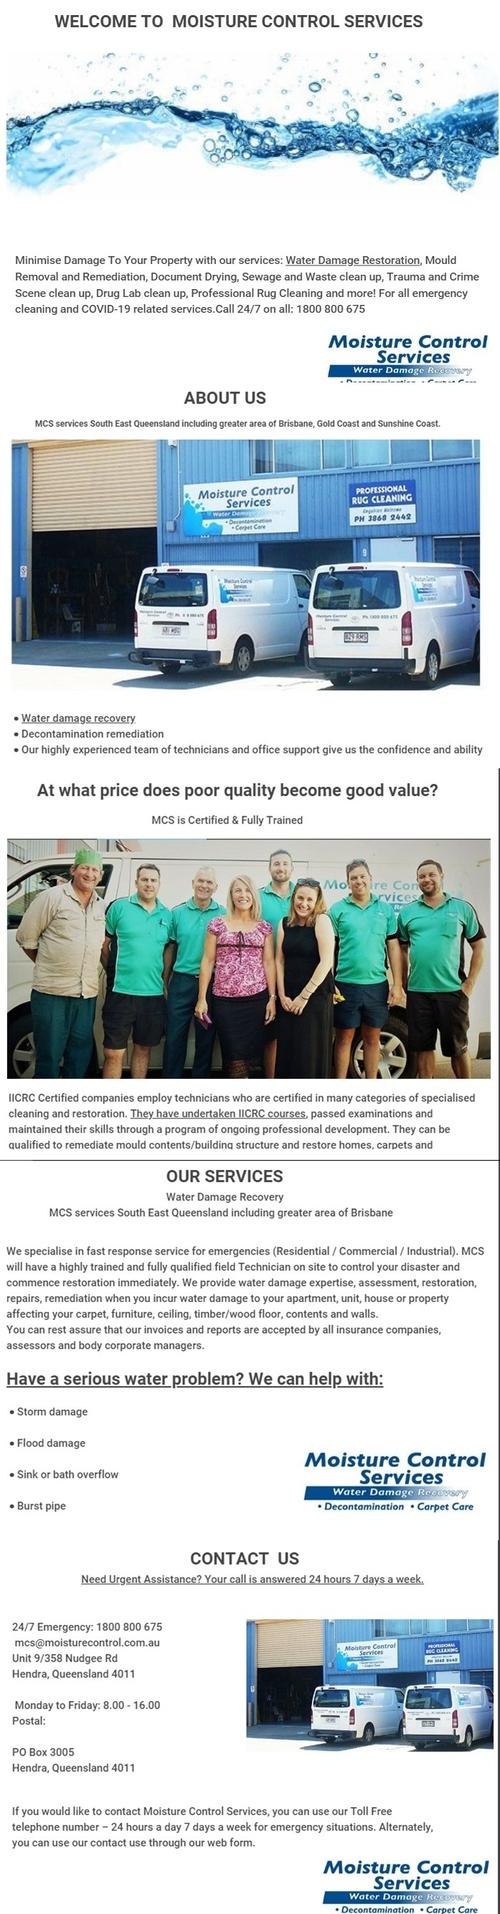 : Water Damage | Water Damage Brisbane | Water Damage Restor... via Moisturecontrol